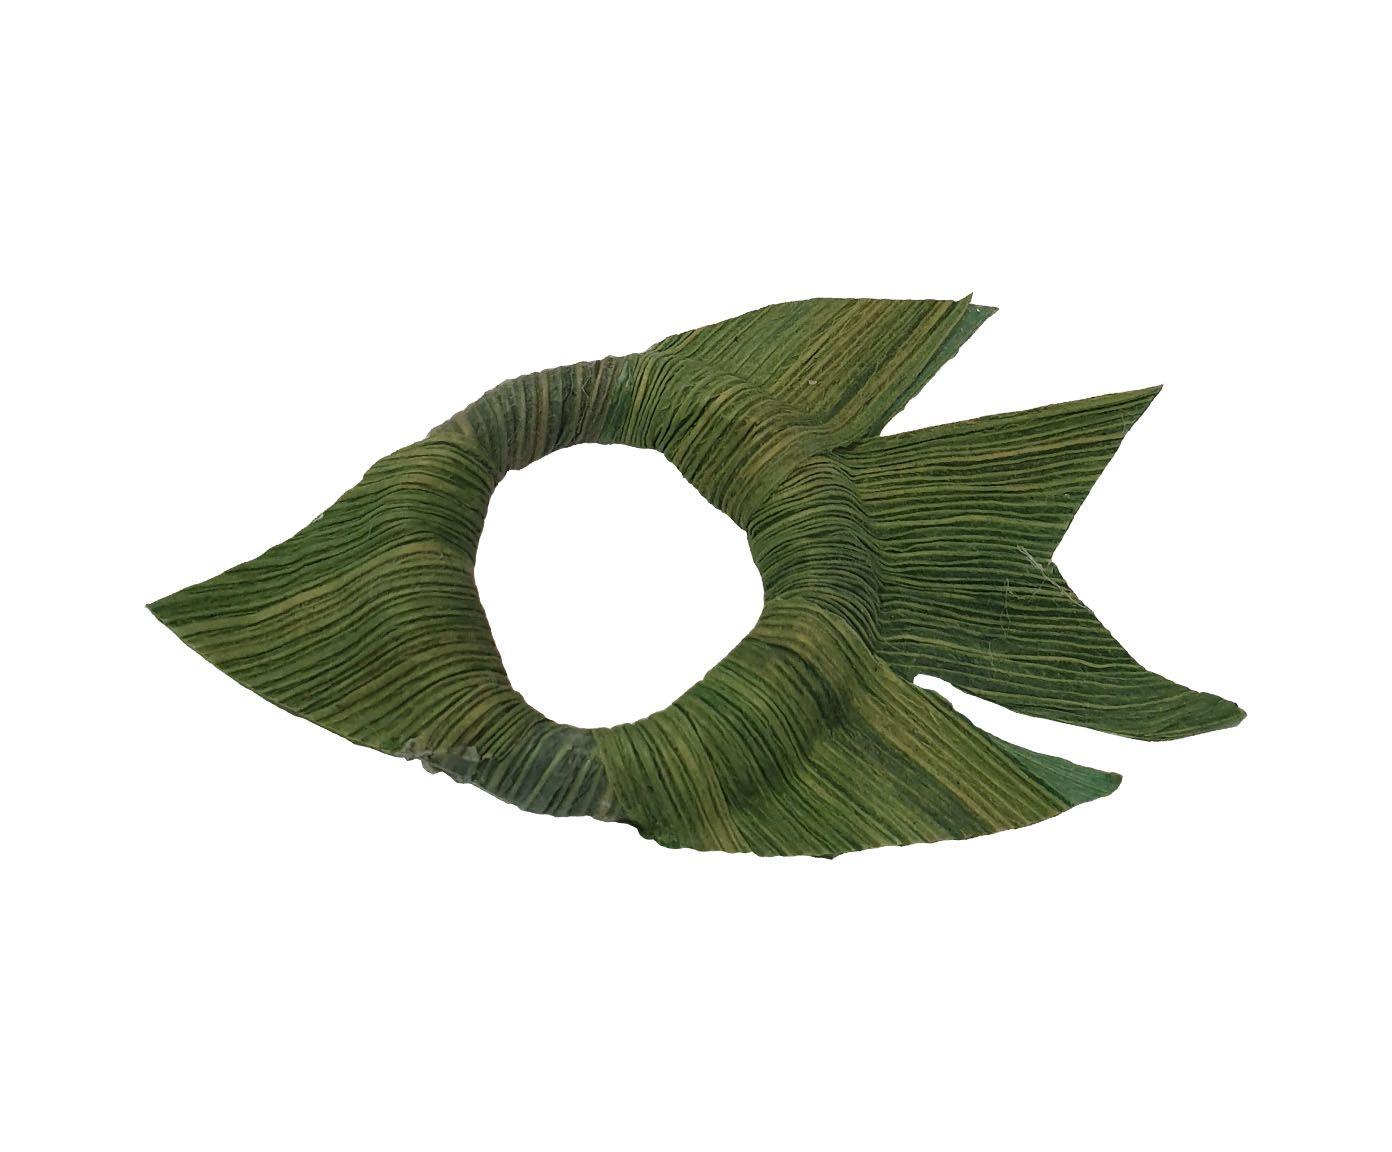 Anel para Guardanapo Peixe Palha Verde - 12X6cm   Westwing.com.br